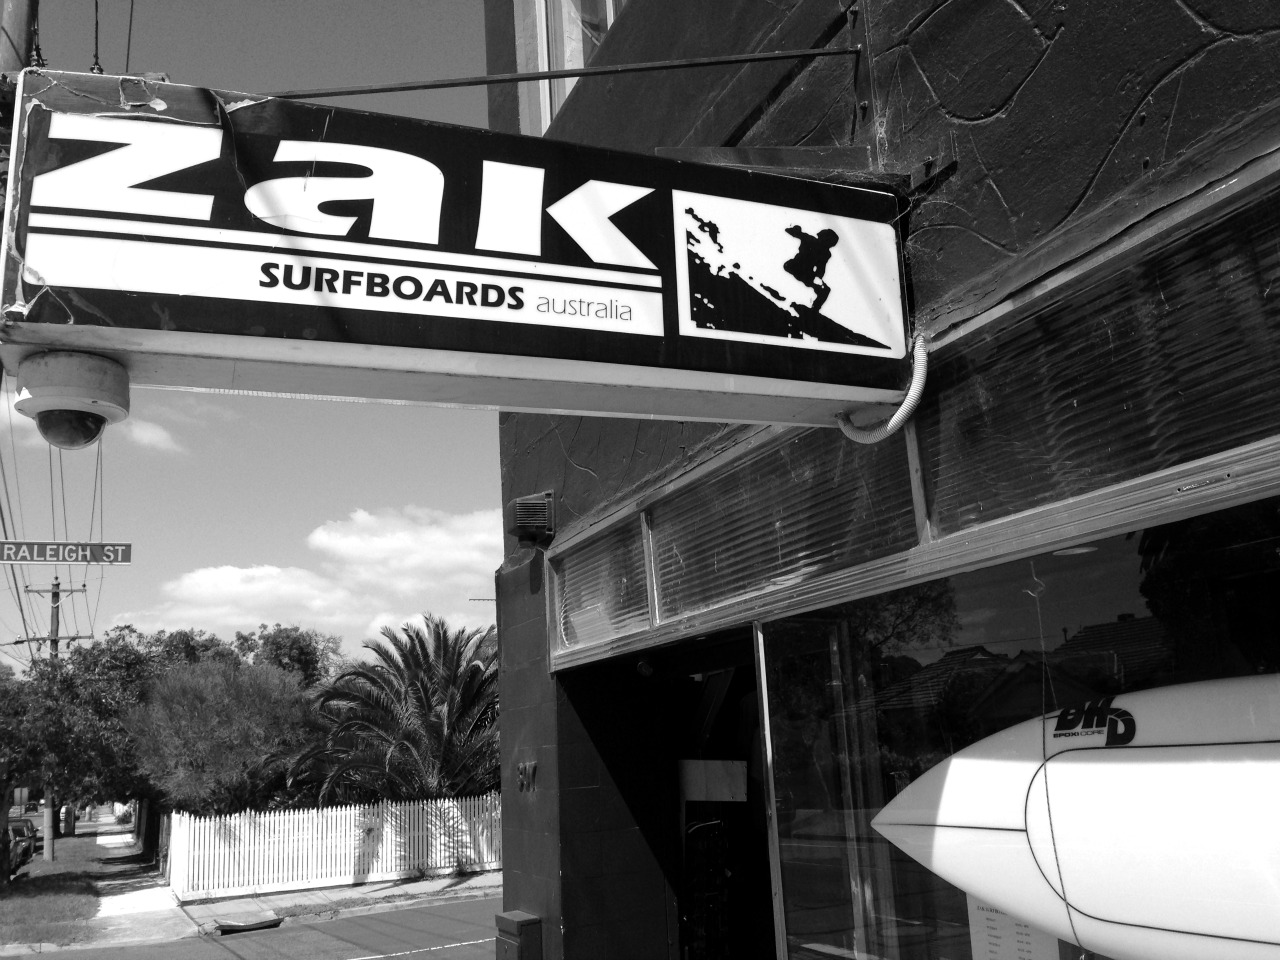 Quick Surfboard Repairs Melbourne Zak Surfboards